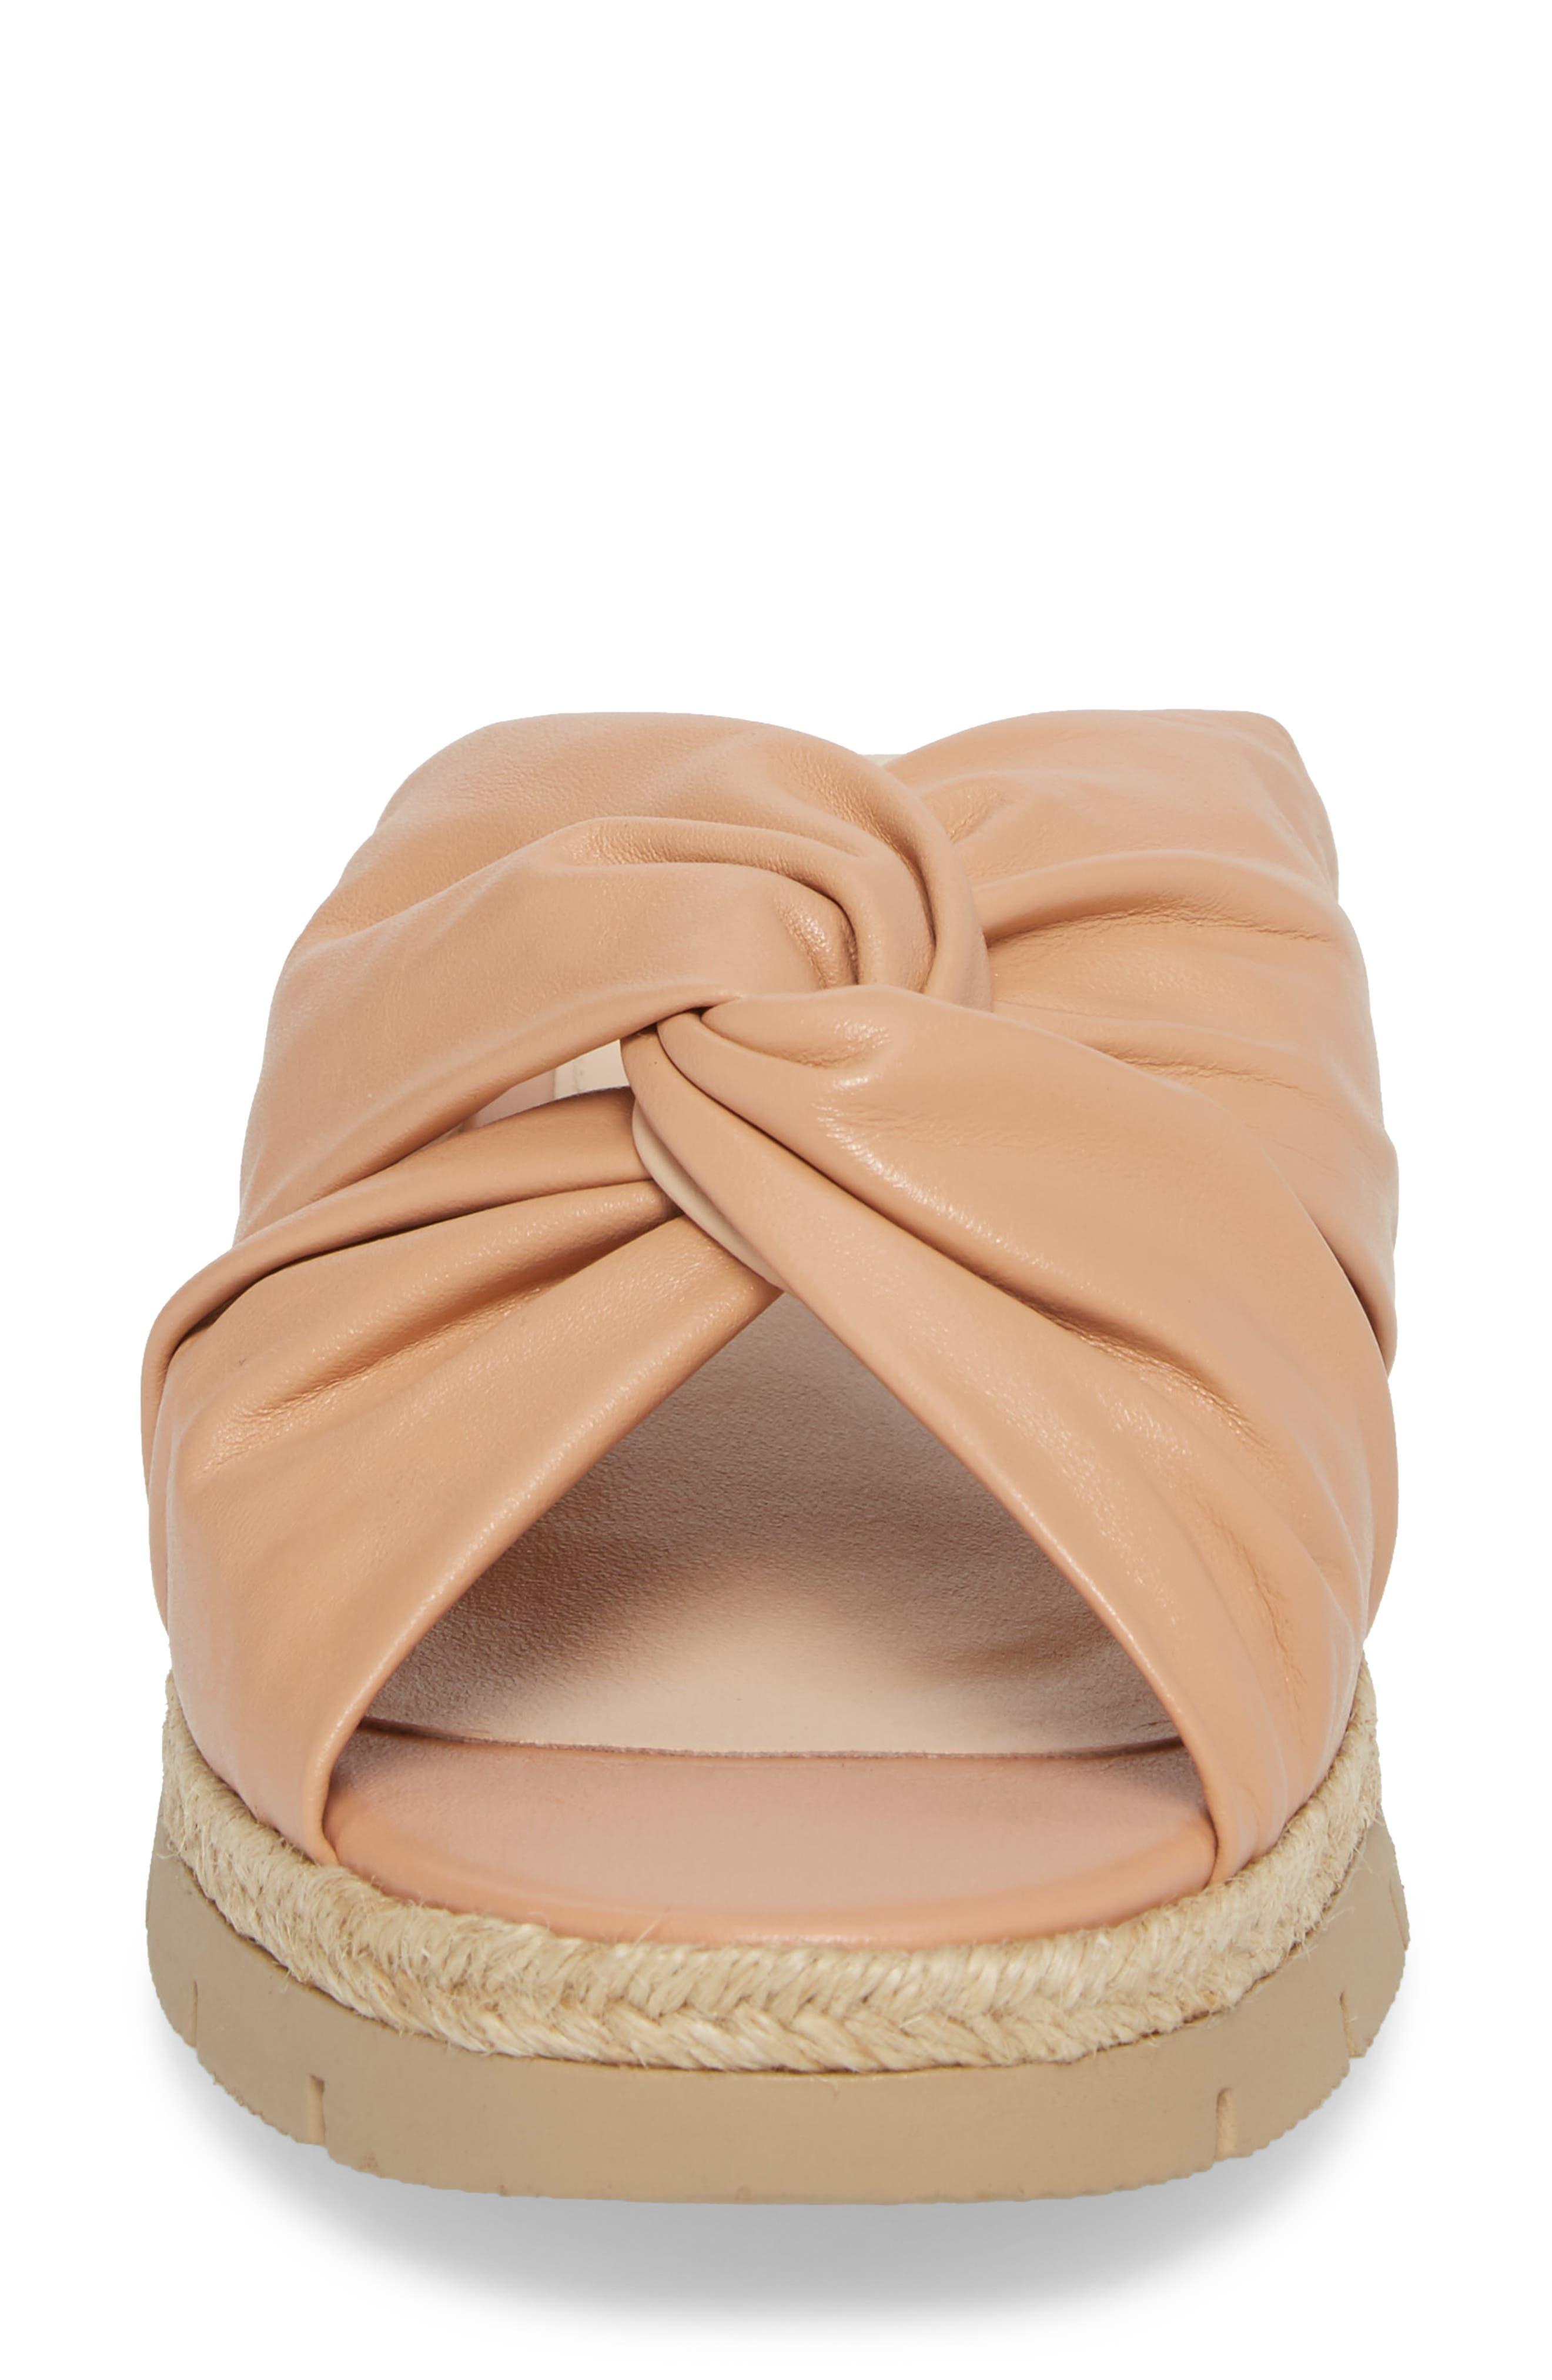 Charlie Slide Sandal,                             Alternate thumbnail 4, color,                             Peach Leather